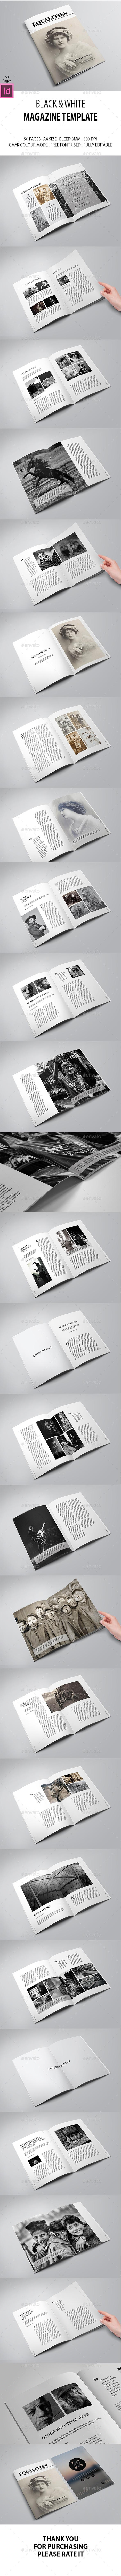 Clean Black & White Magazine